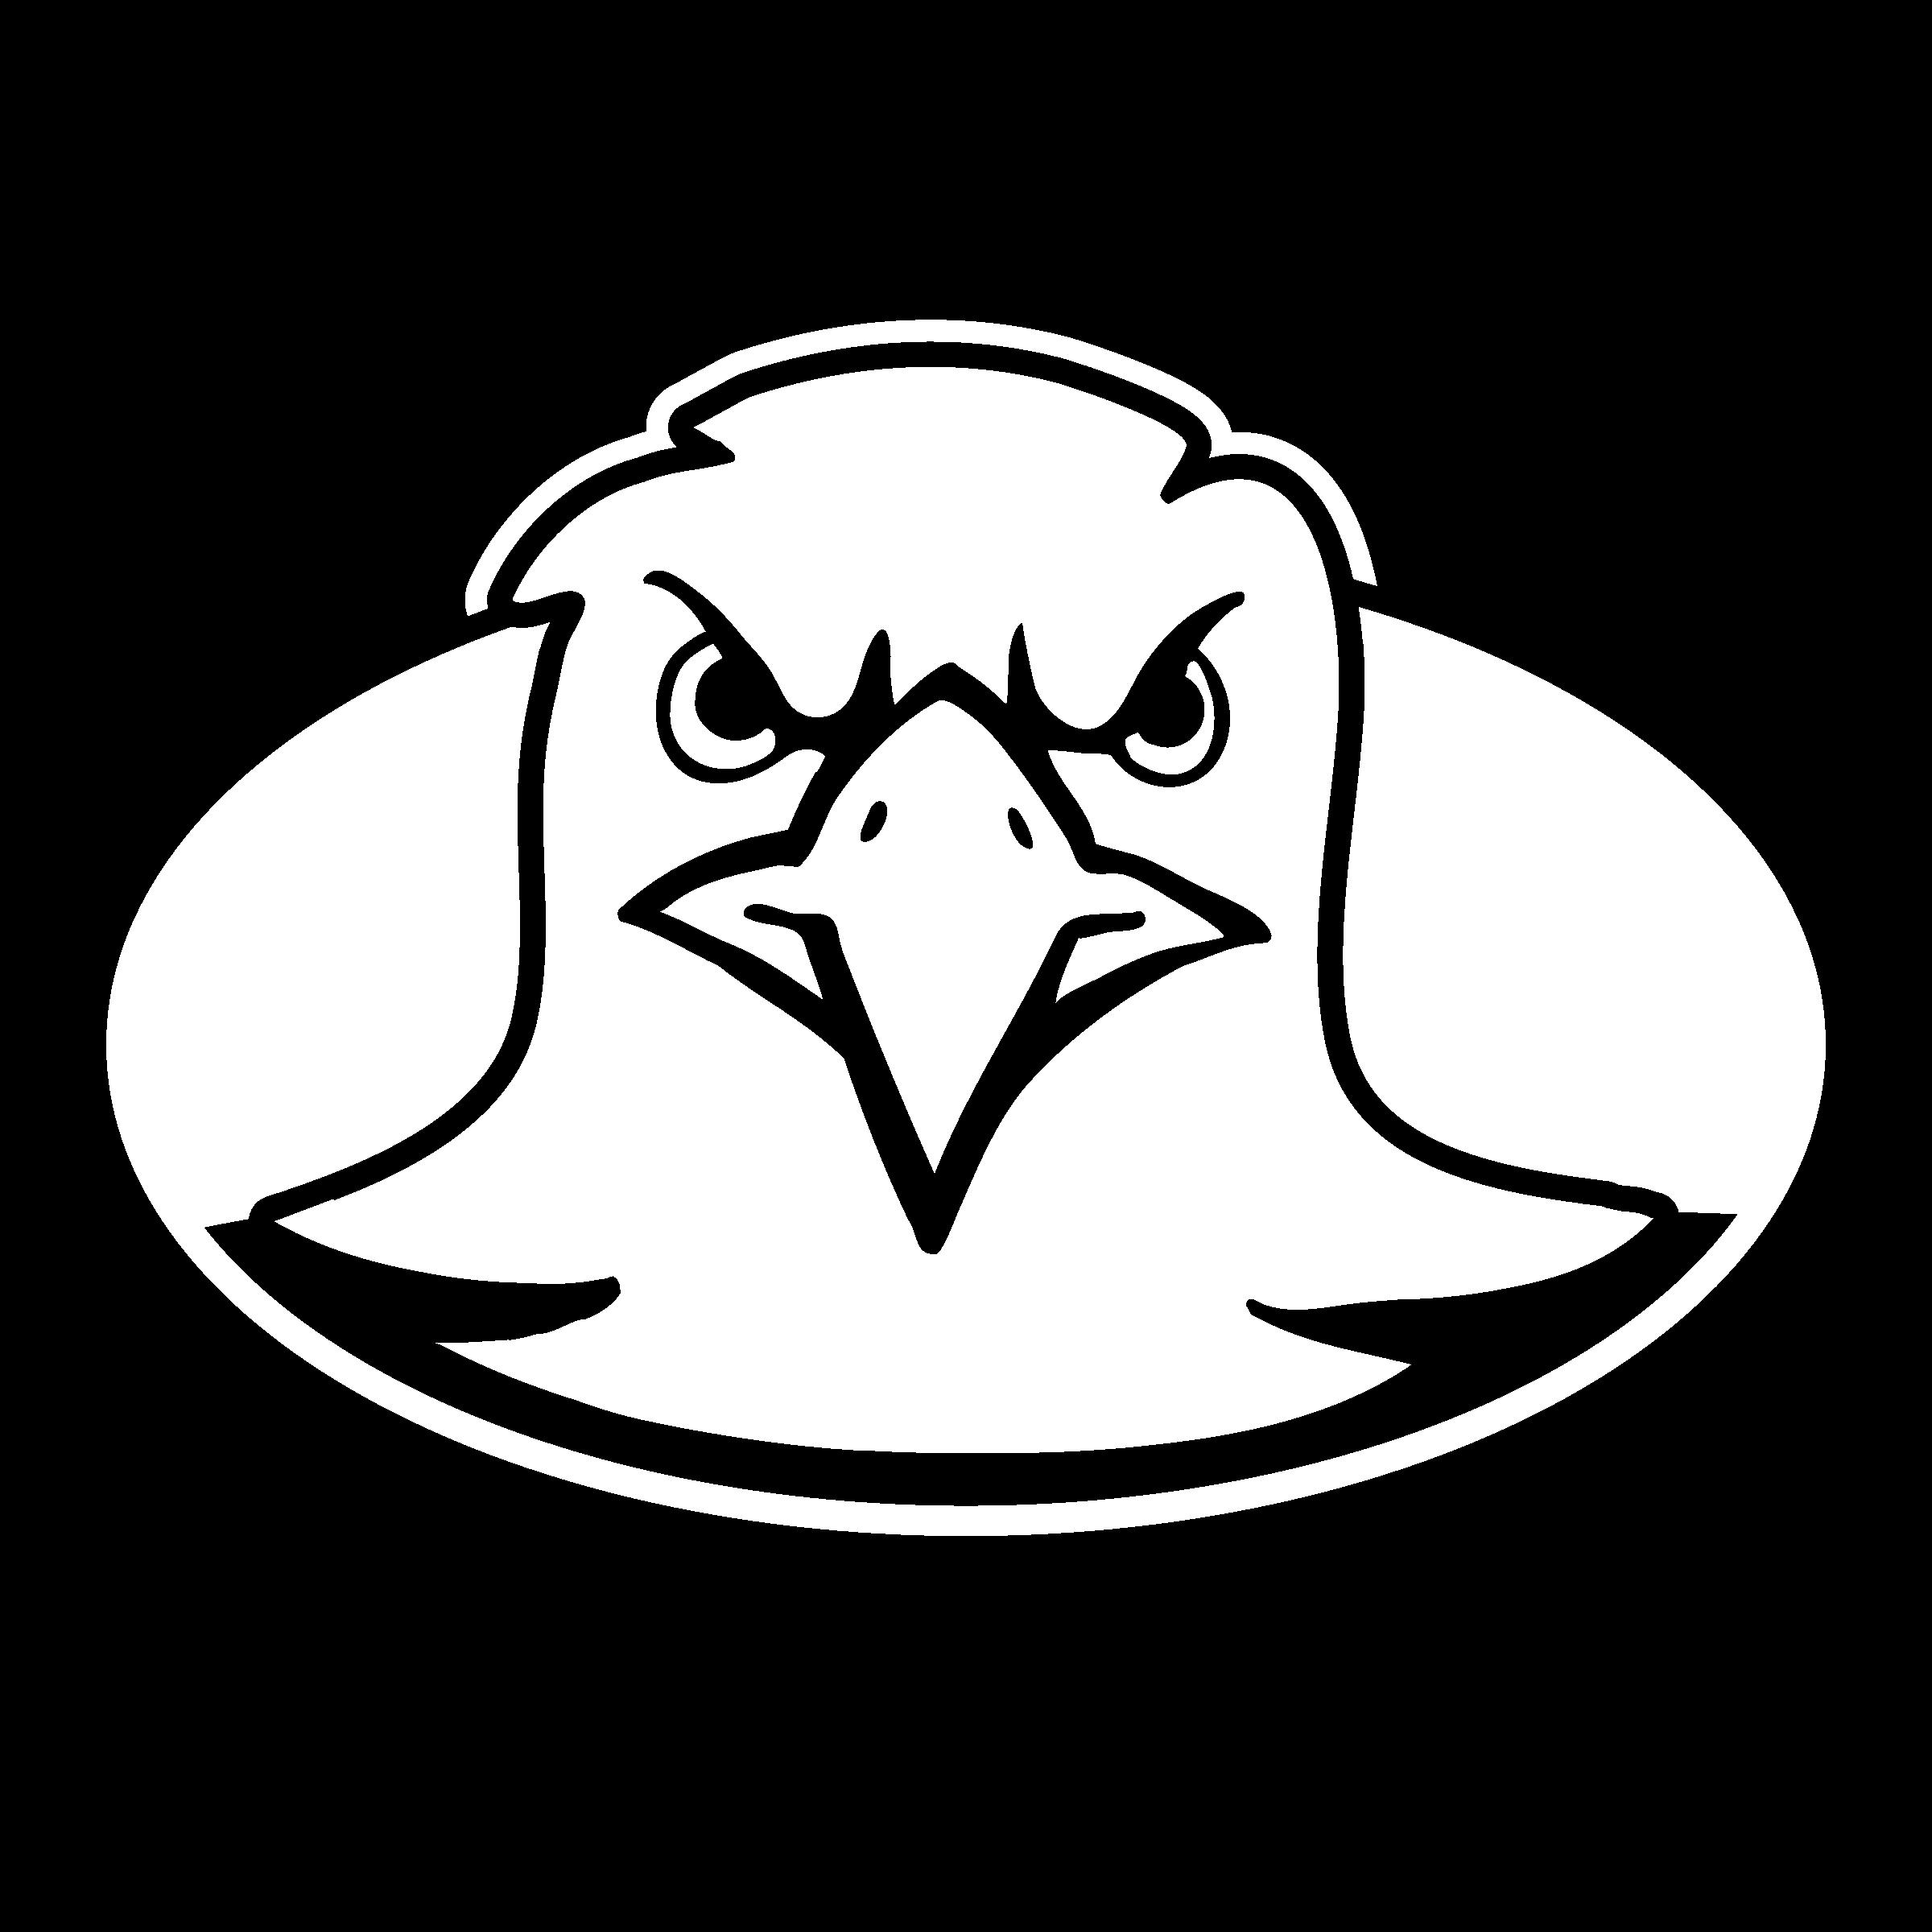 2400x2400 Boston College Eagles Logo Png Transparent Vector